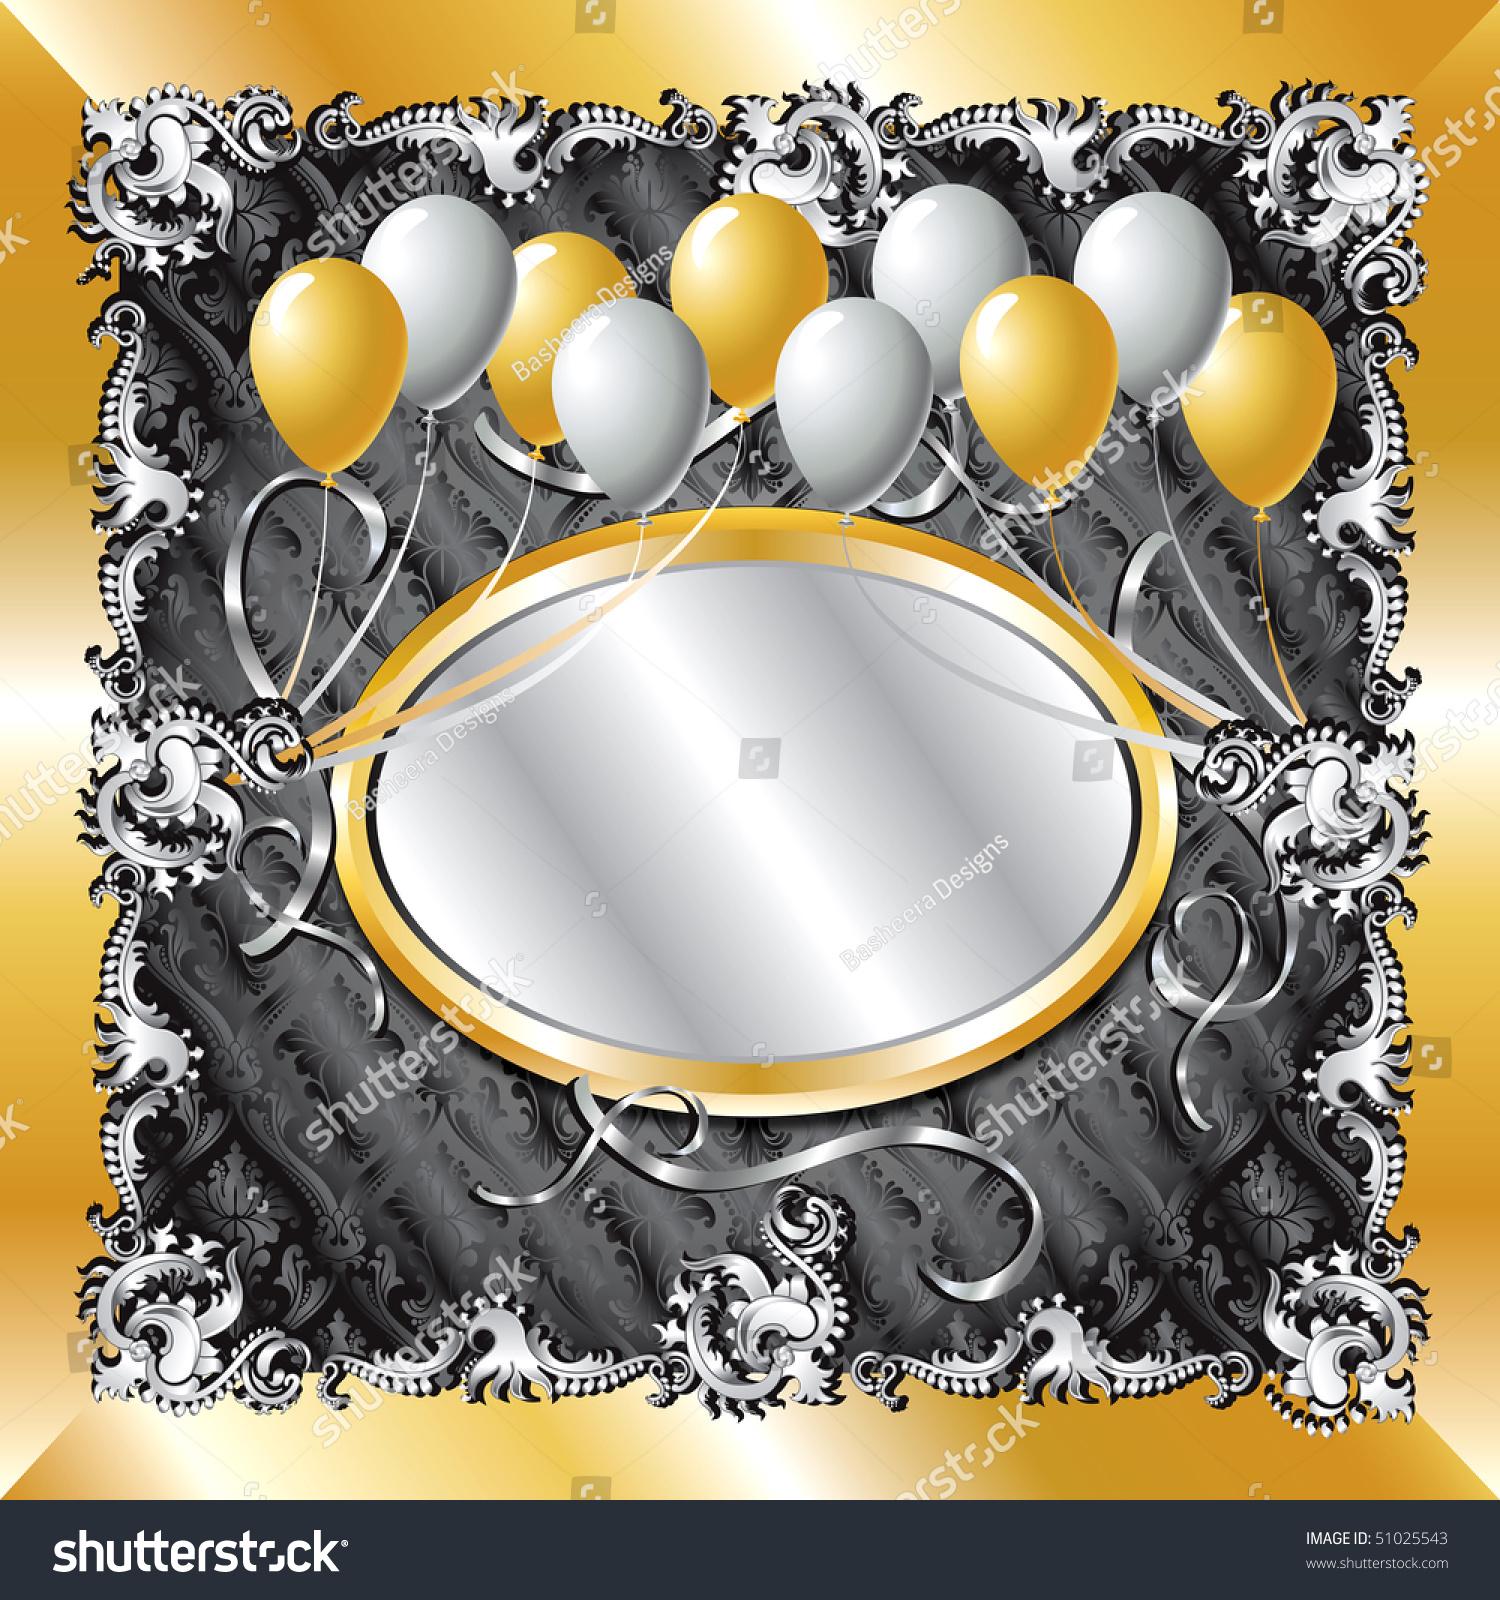 Vector Illustration Gold Silver Balloon Template Stock